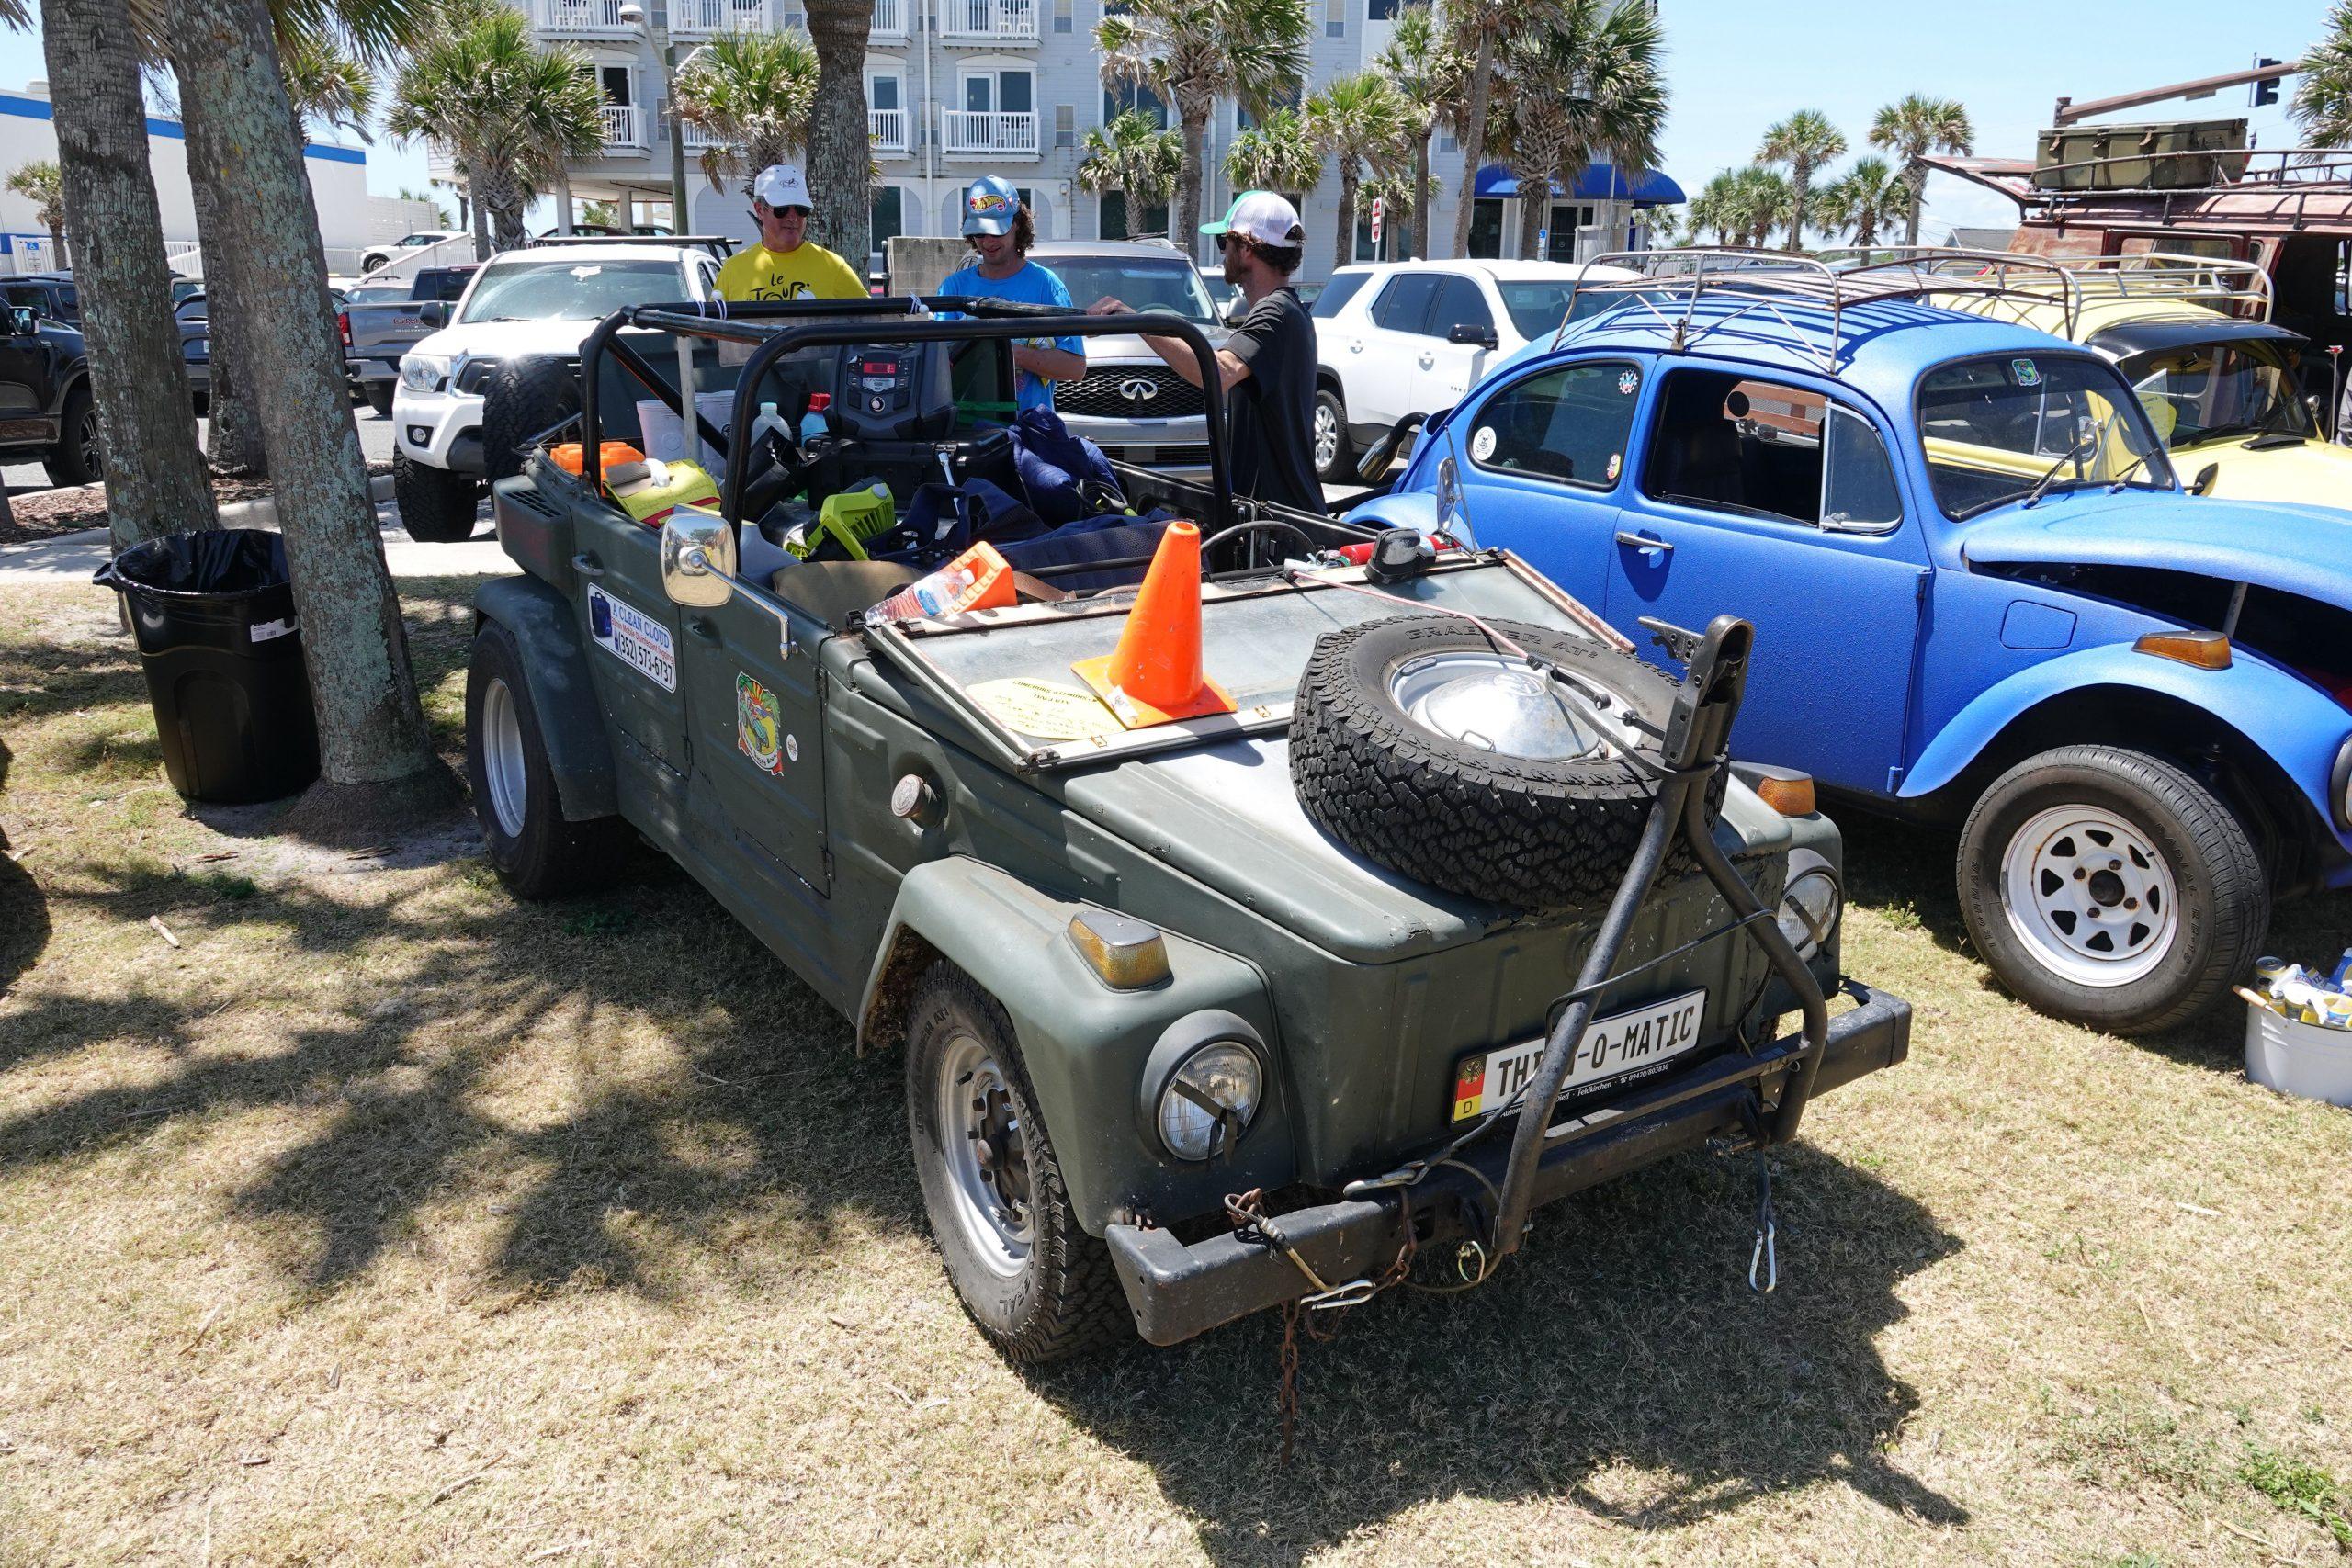 2021 Amelia Island Lemons - 1973 VW Type 181 Thing-O-Matic